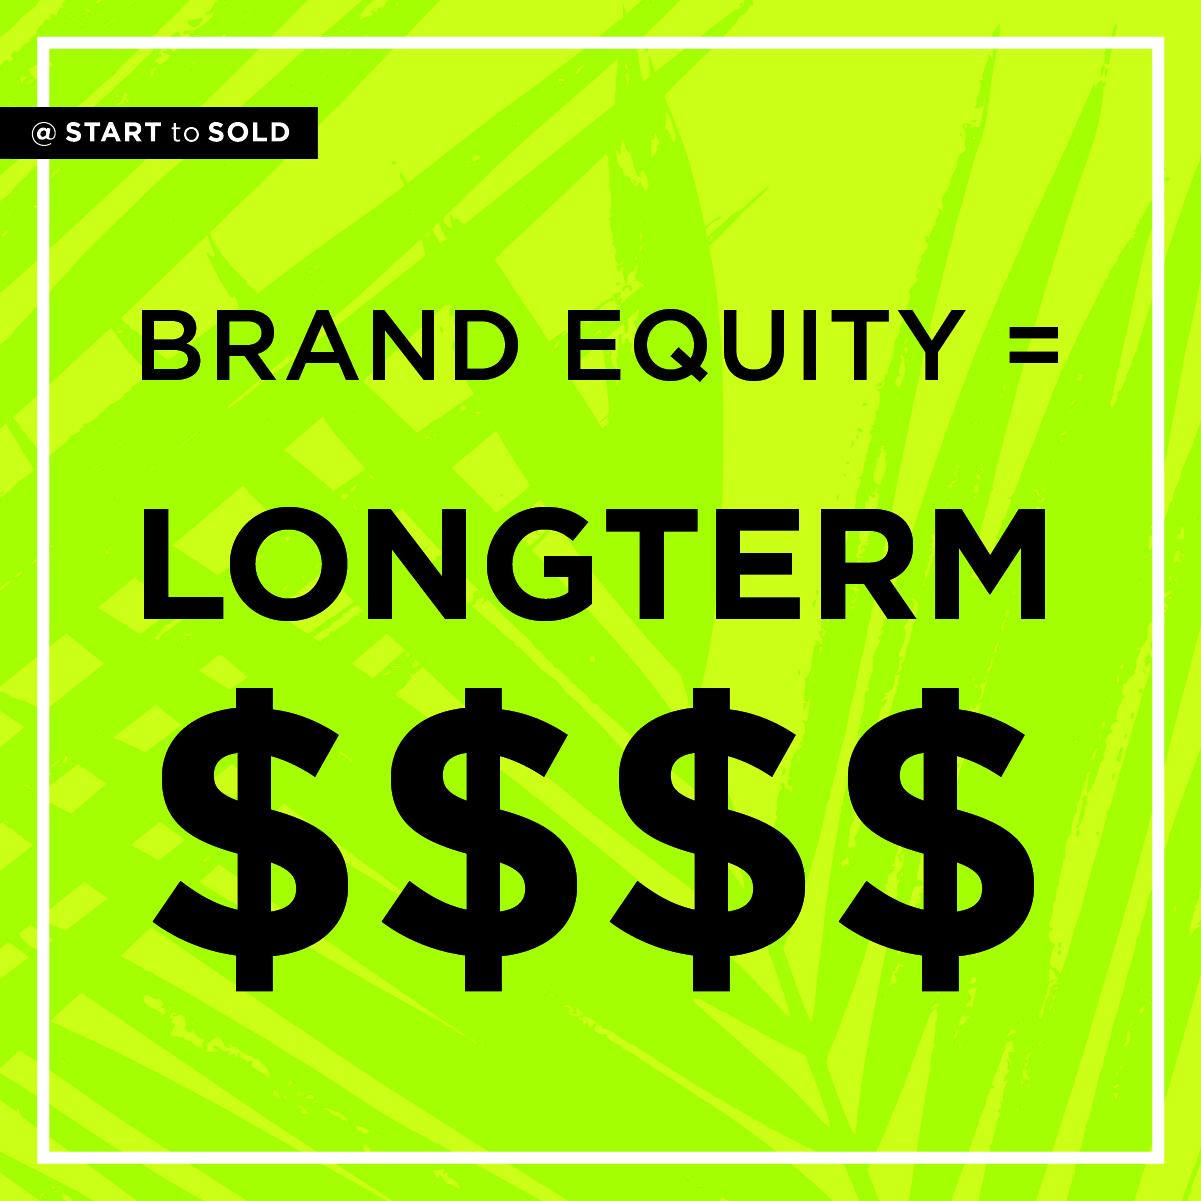 Brand Equity=Long Term Money